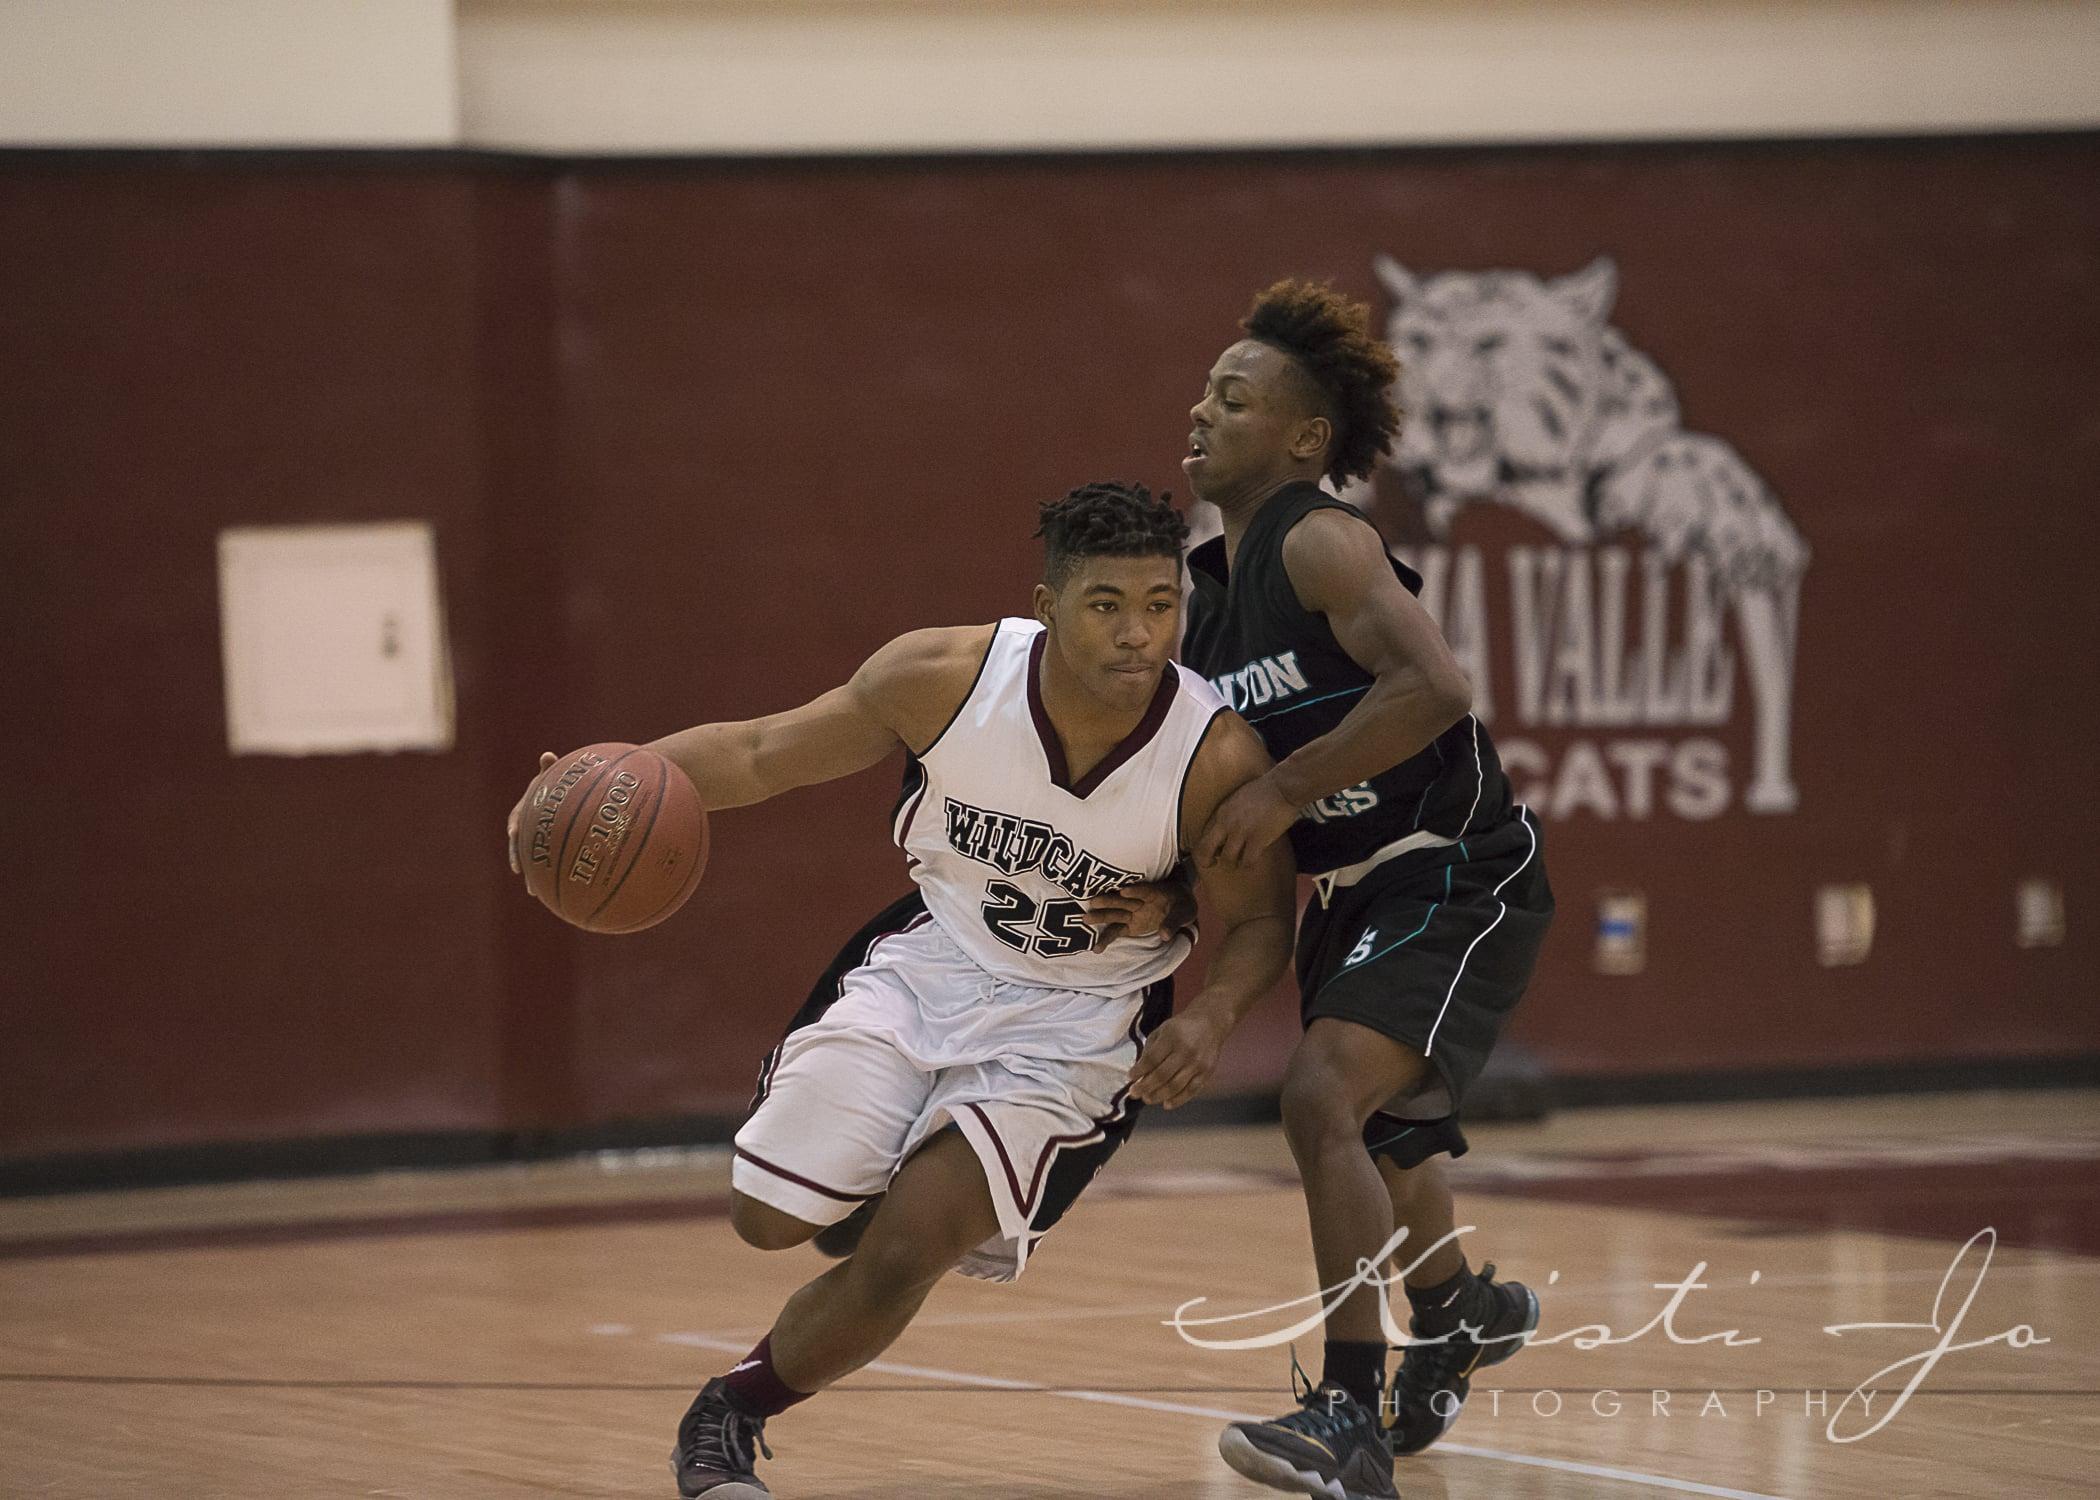 Basketball2.jpg